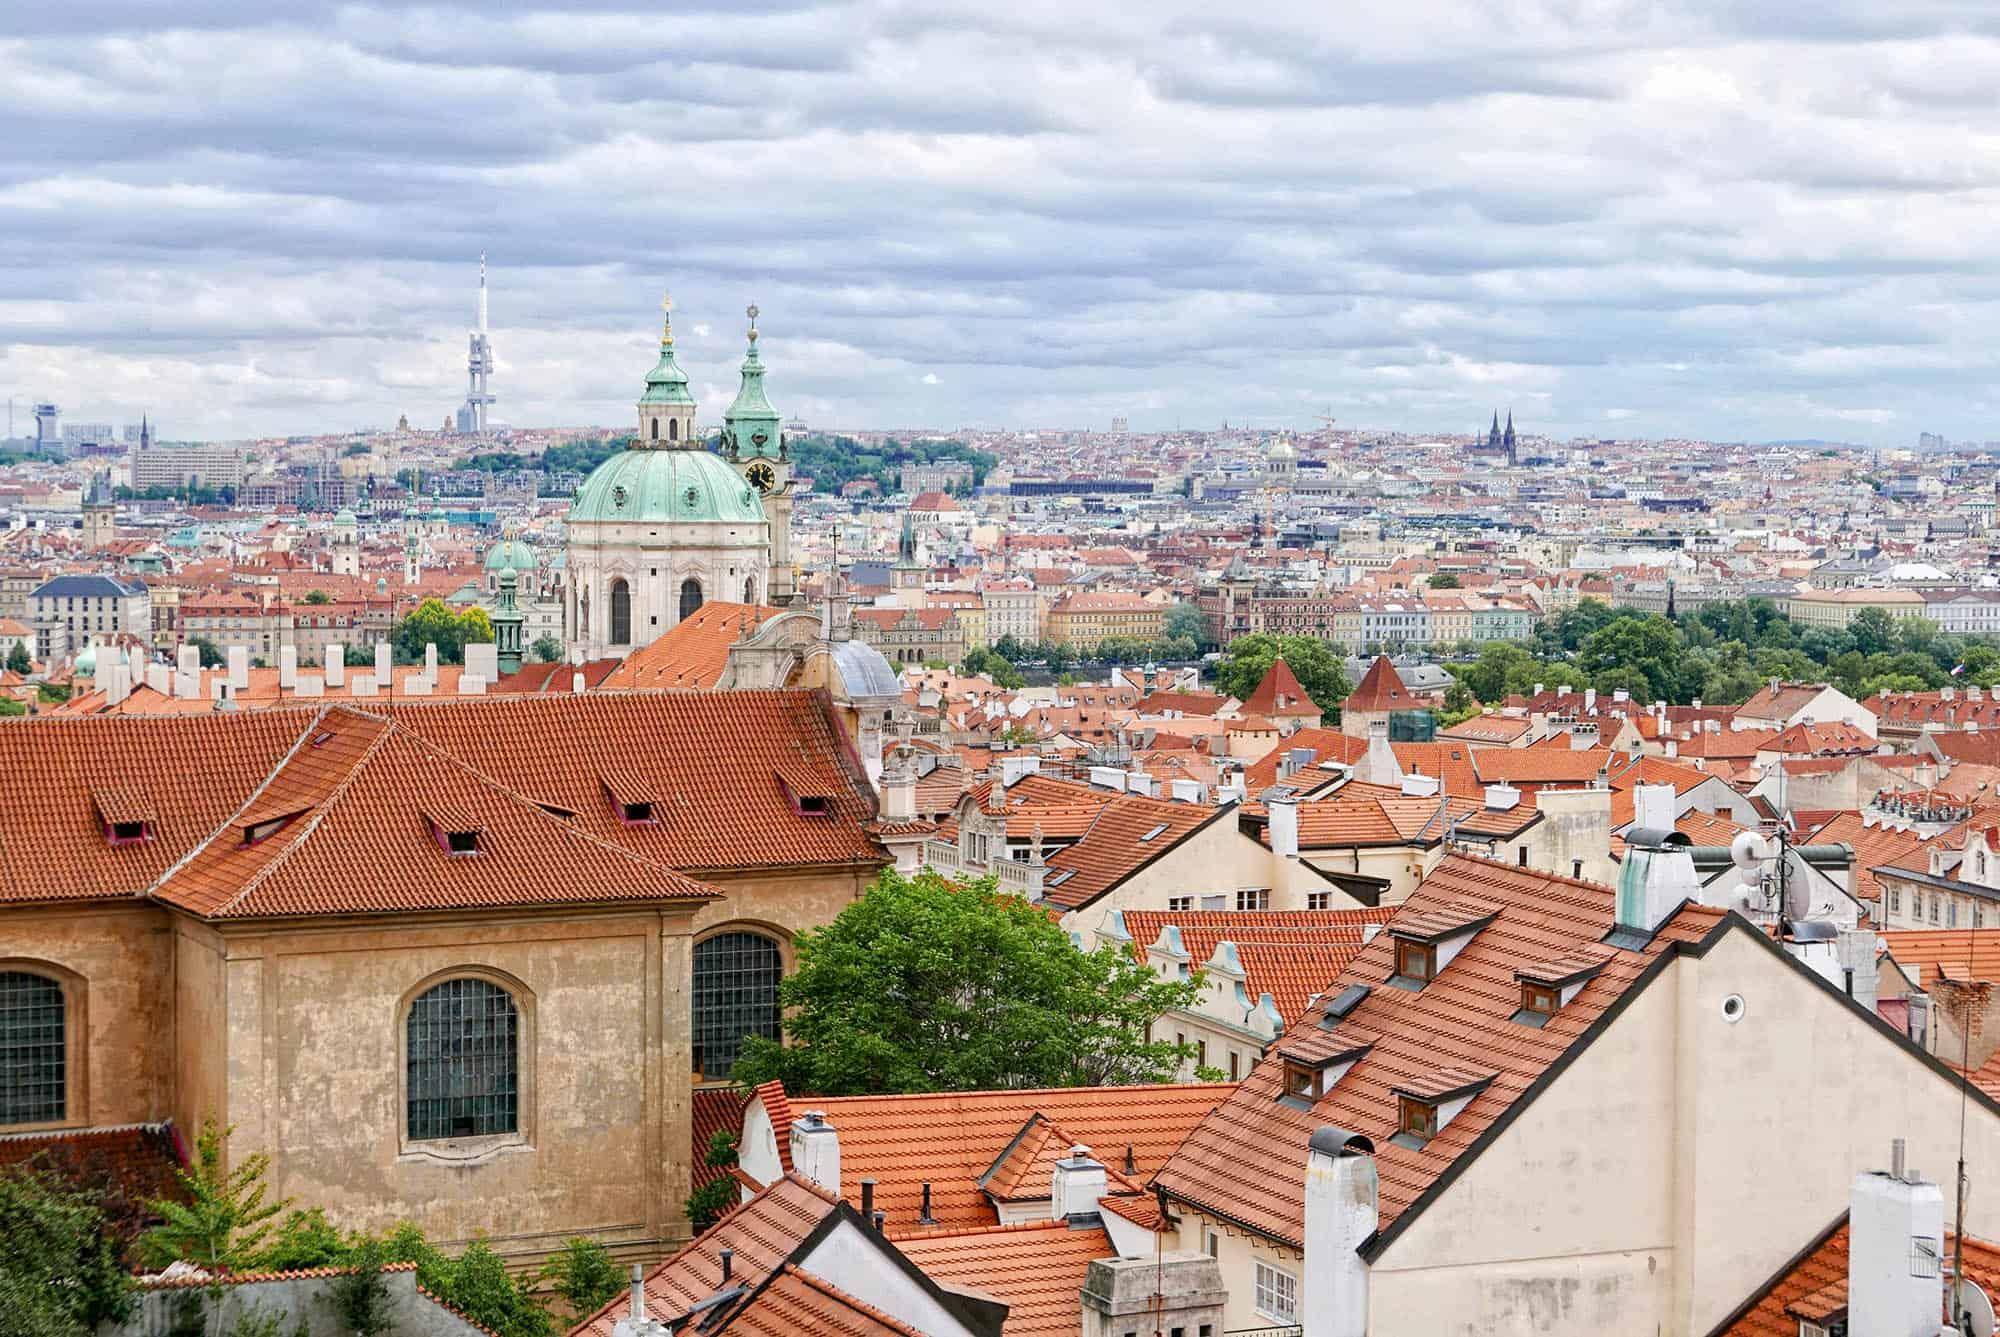 Citytrip Praag: 11 bezienswaardigheden die je niet mag missen